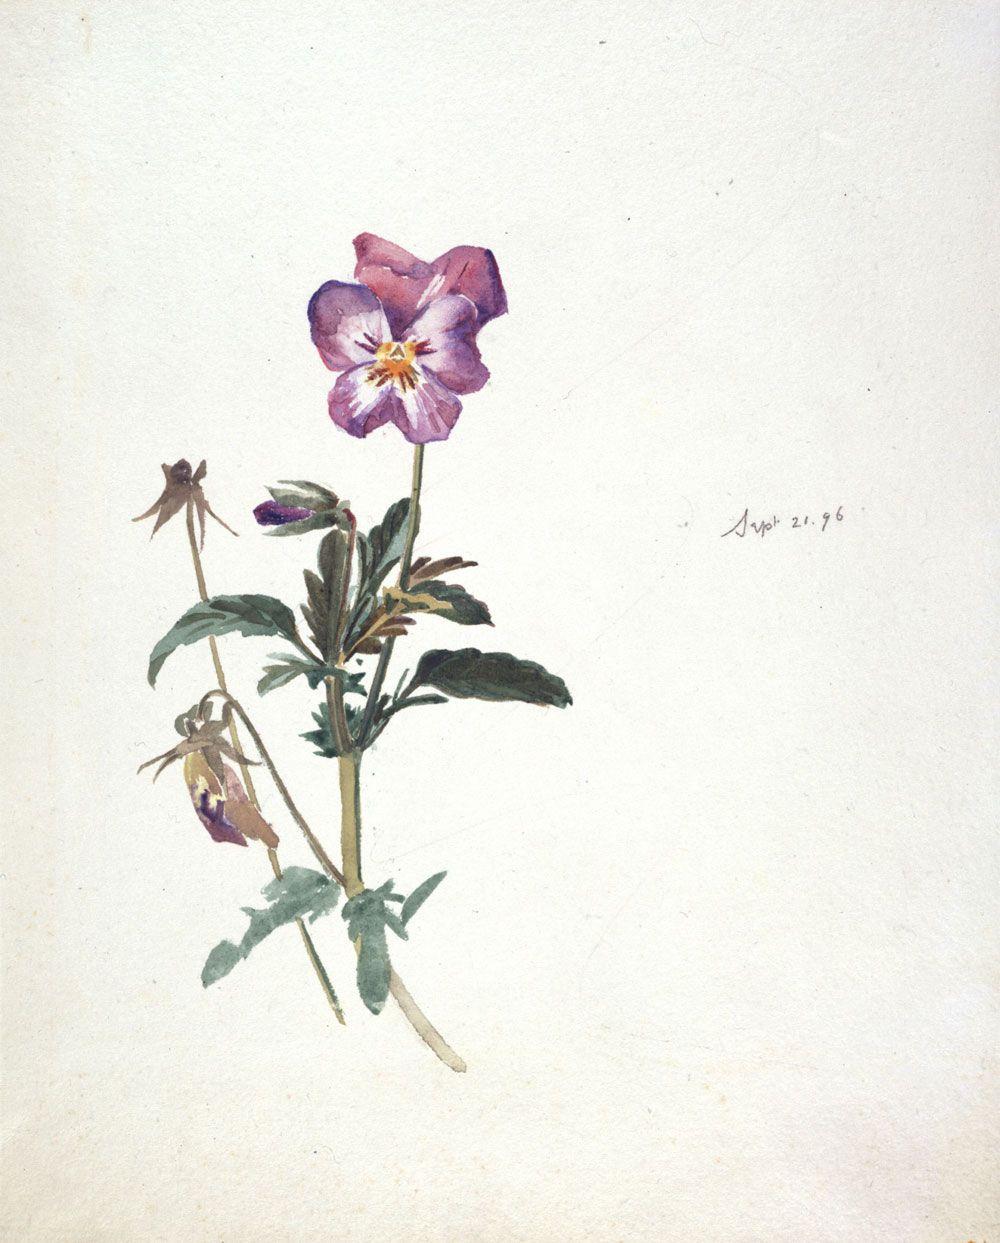 Beatrix Potter Botanical Drawings | Beatrix Potter, Pansy, 21 September 1896. © Frederick Warne & Co